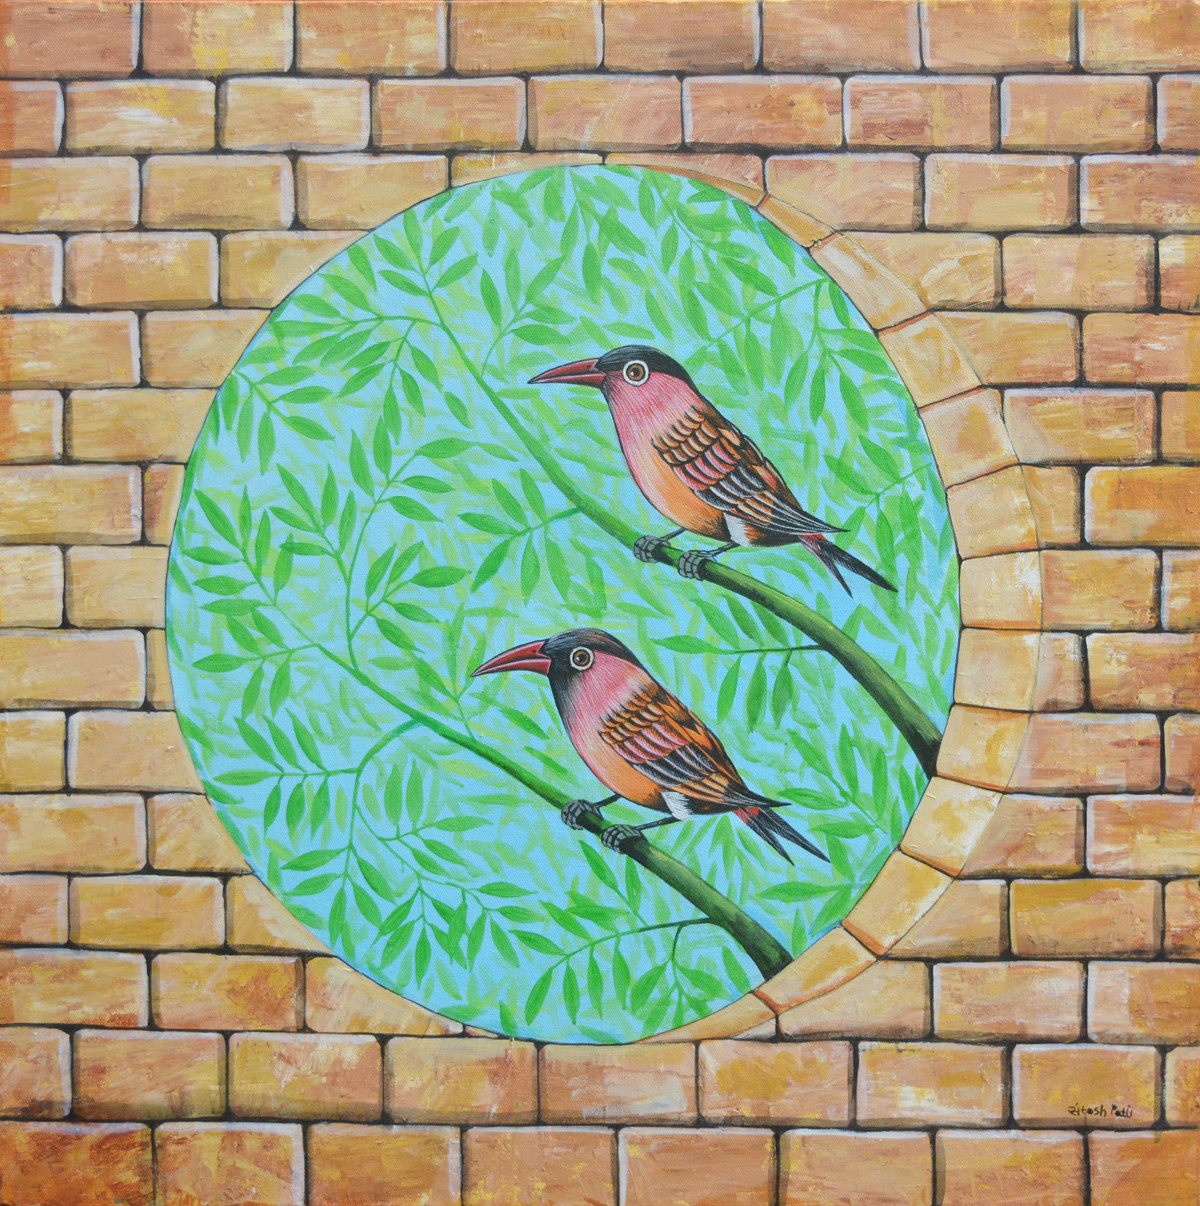 Birds 1010 by santosh patil, Decorative Painting, Acrylic on Canvas, Mongoose color